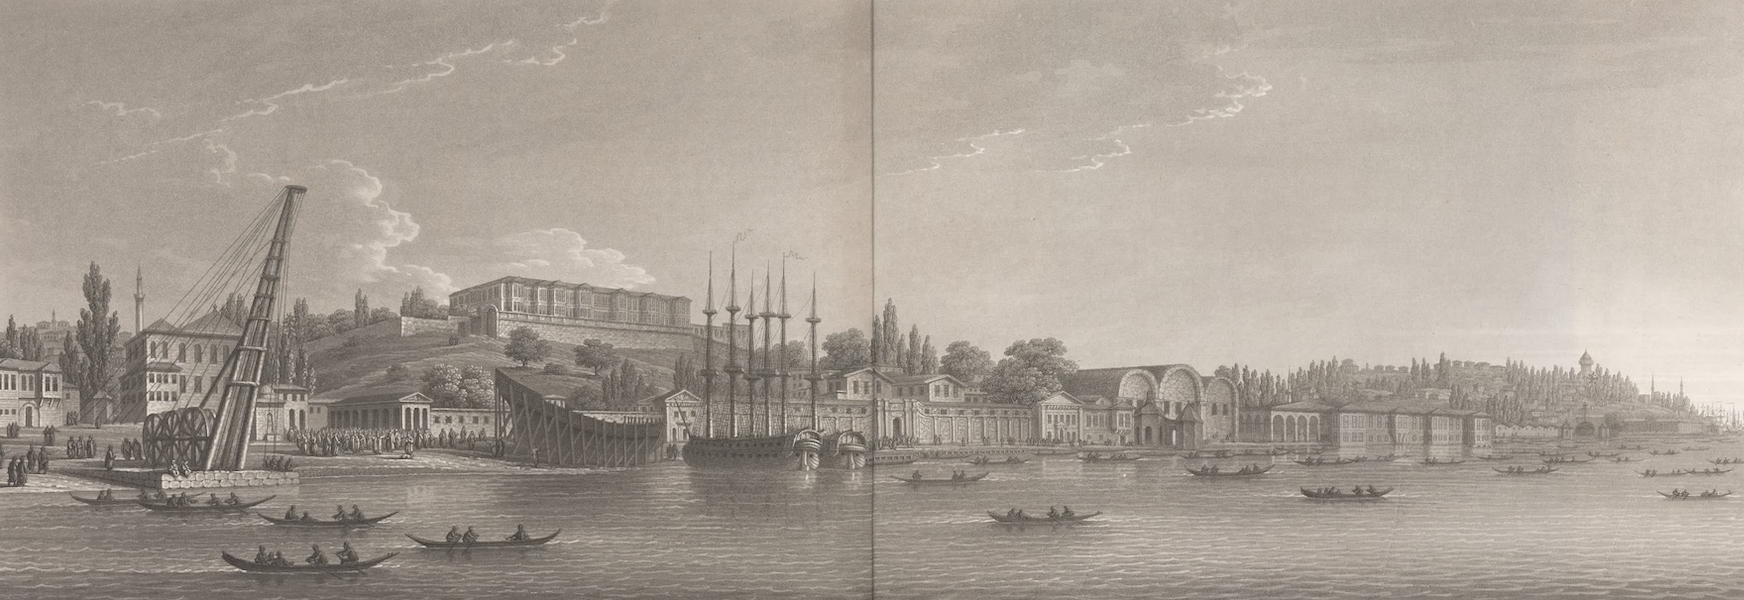 Promenades Pittoresques dans Constantinople Atlas - XI. Vue des Etablissements de la Marine (1817)